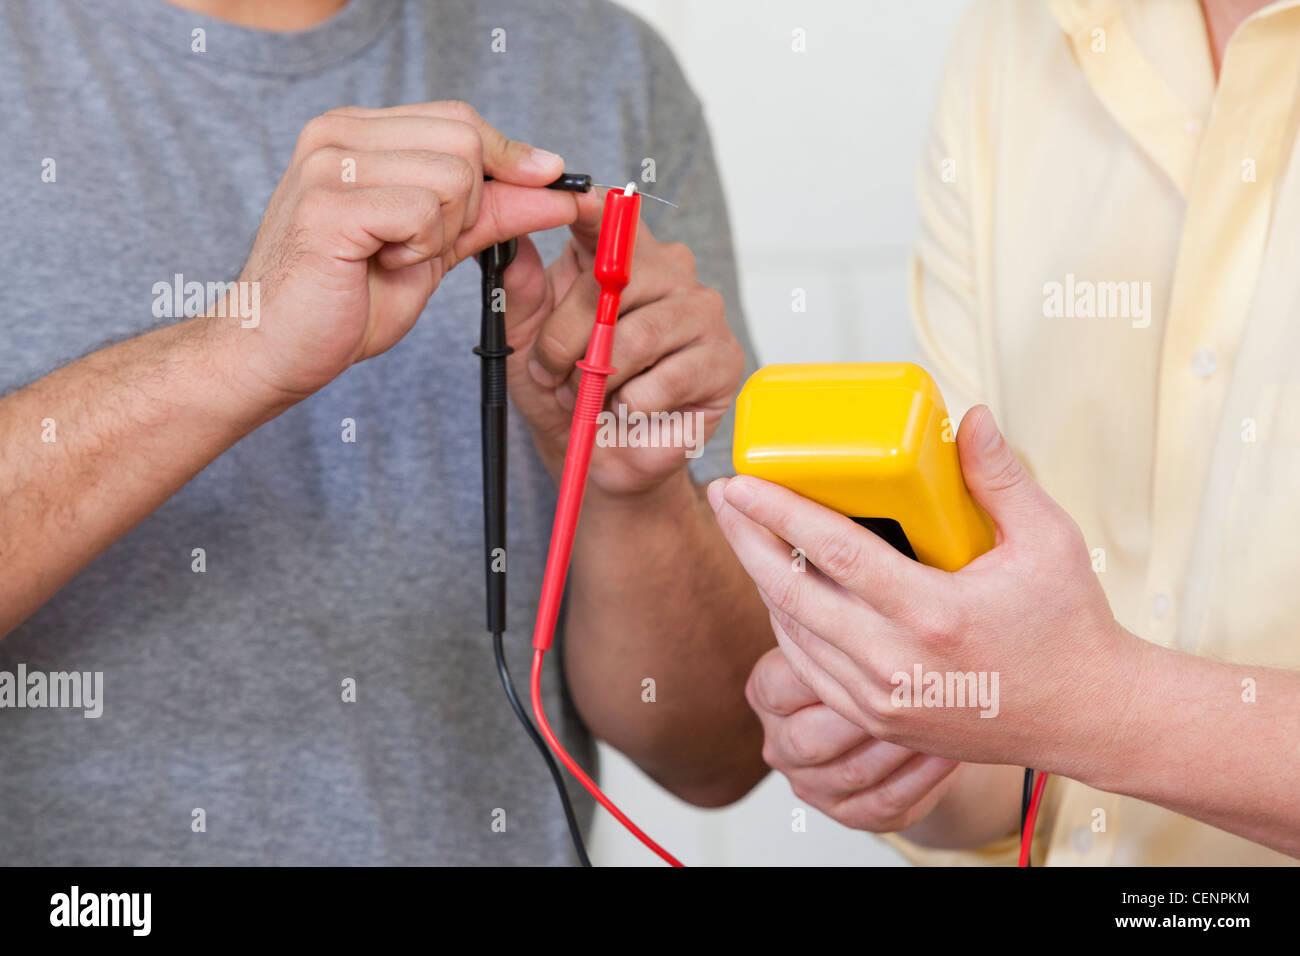 Engineering students measuring resistor using multimeter - Stock Image